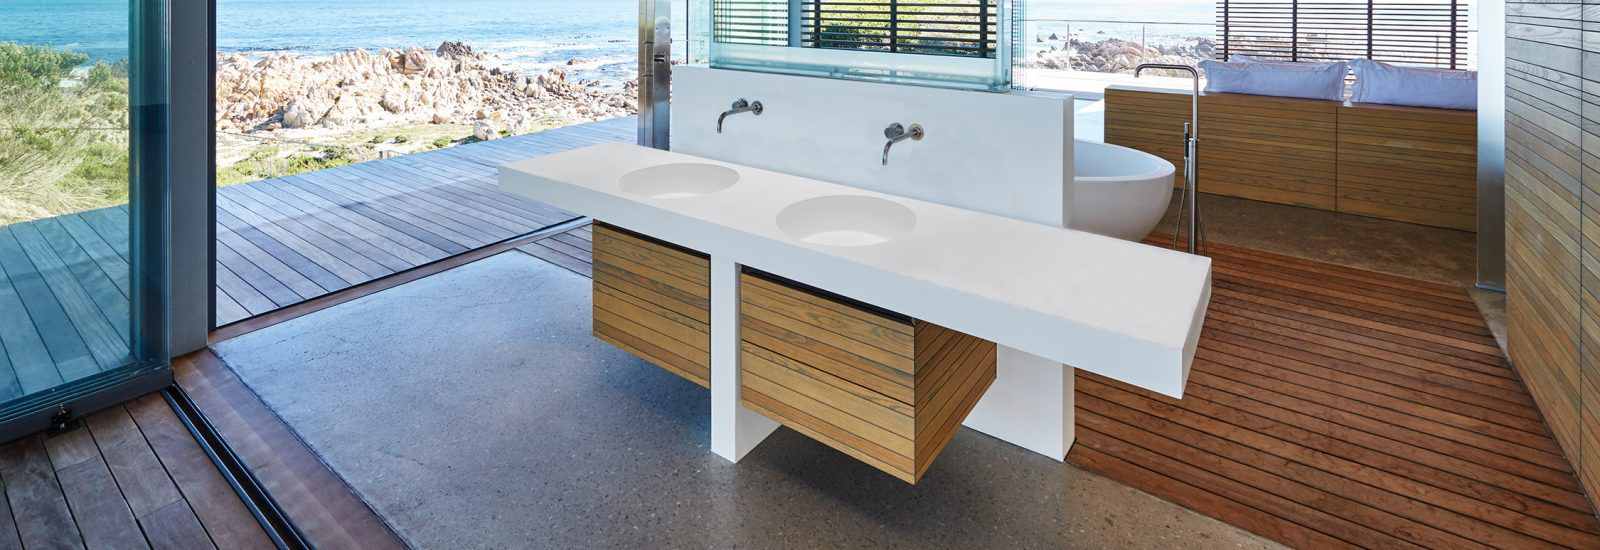 RM Living Cincinnati Modern Bathrooms By MTI MTI3